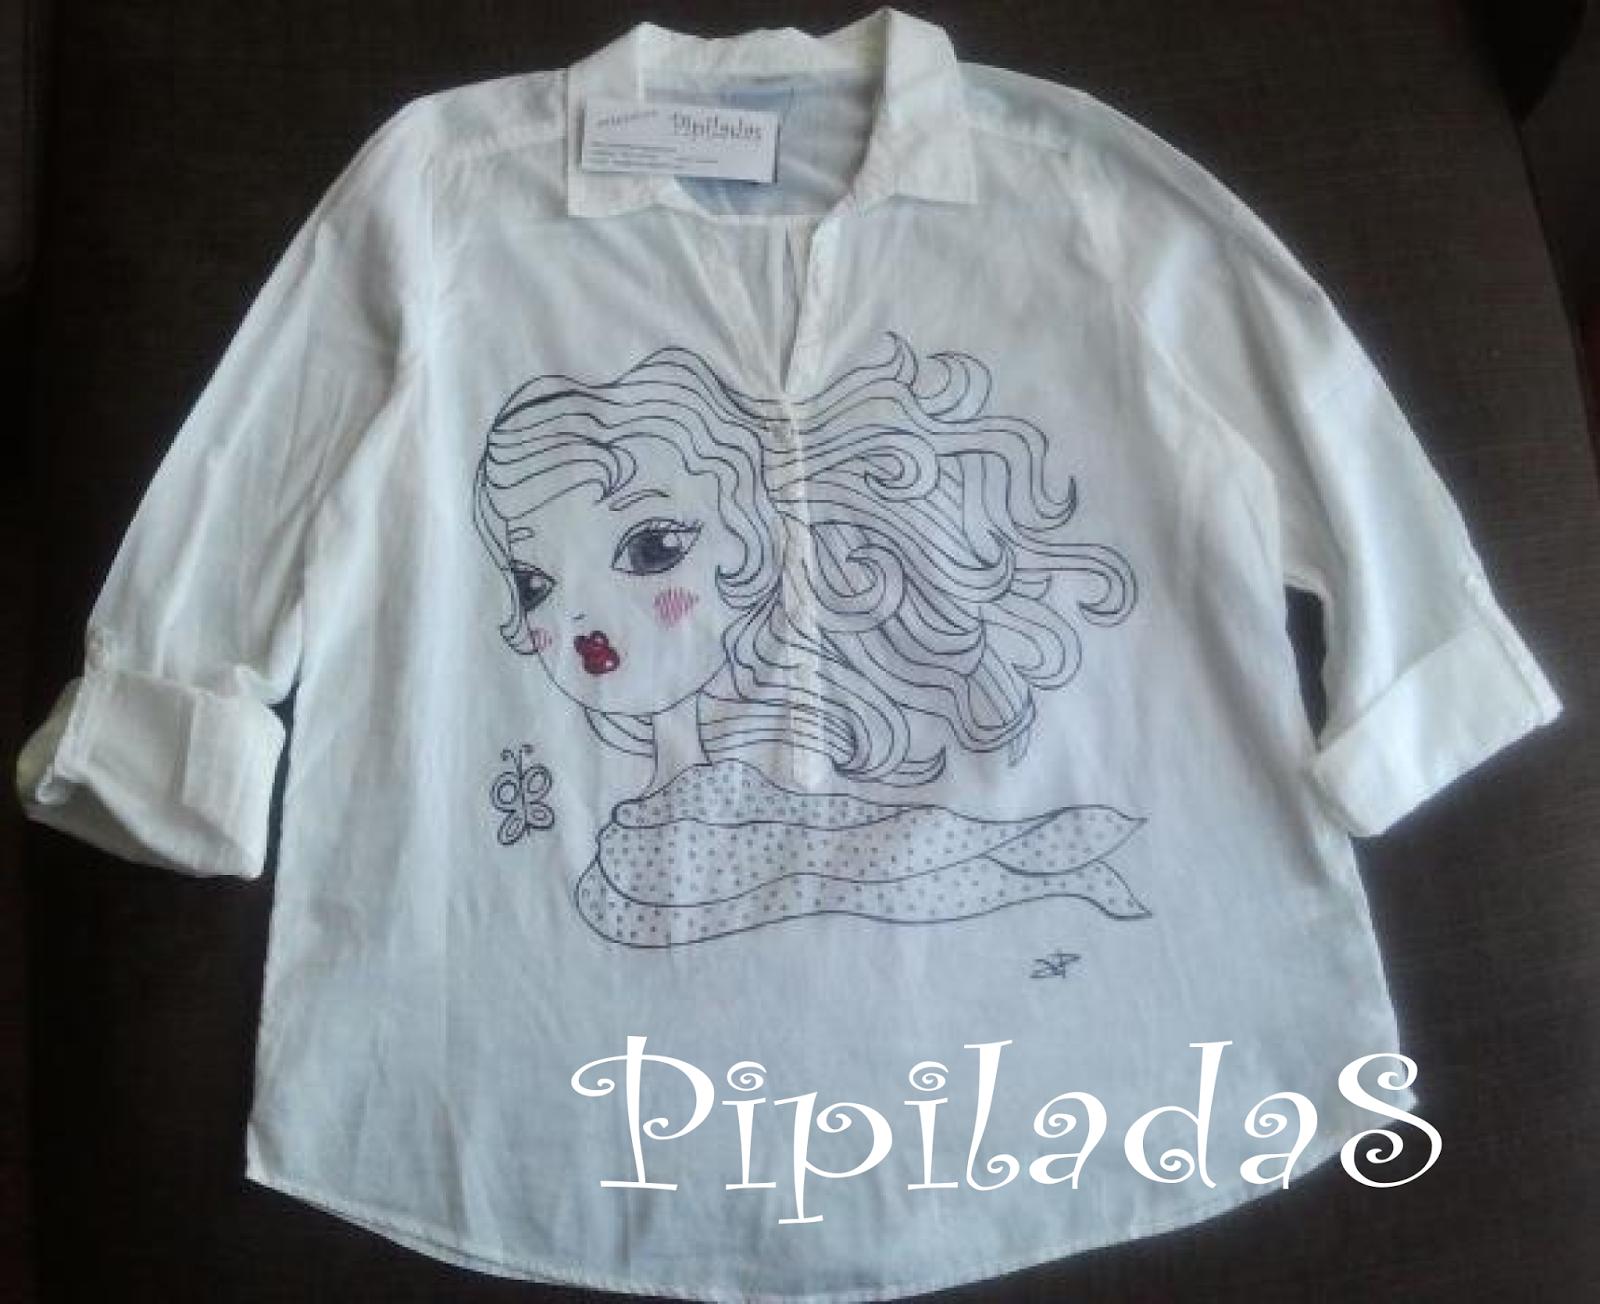 camisa blanca con dibujo original